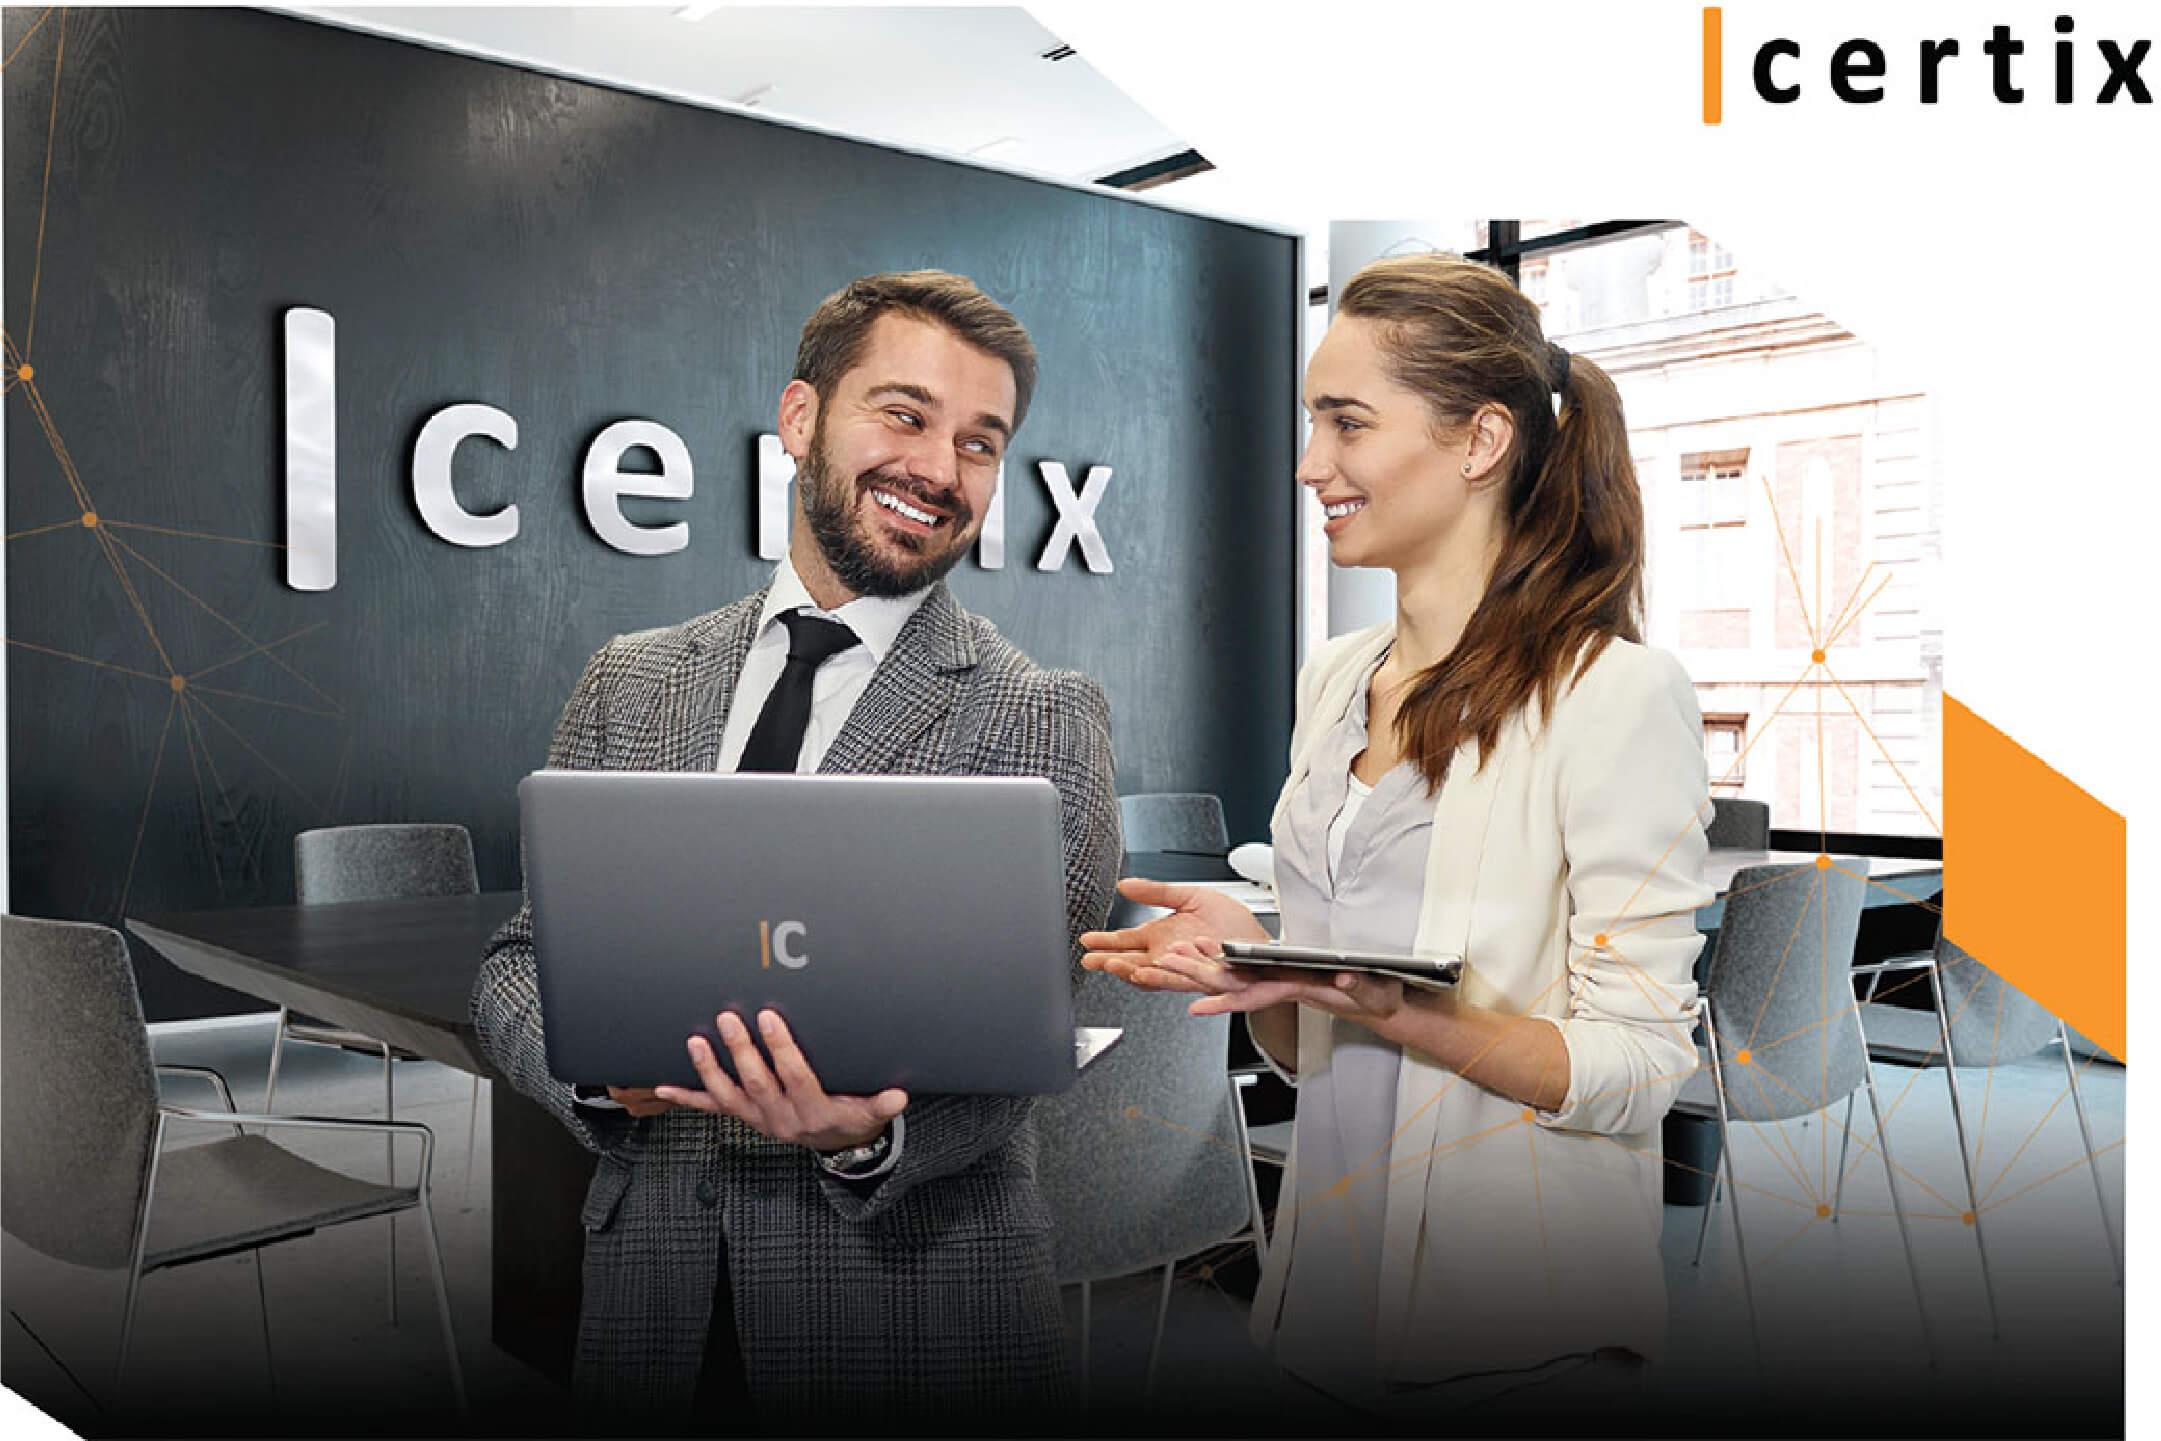 Red de asociados Certix